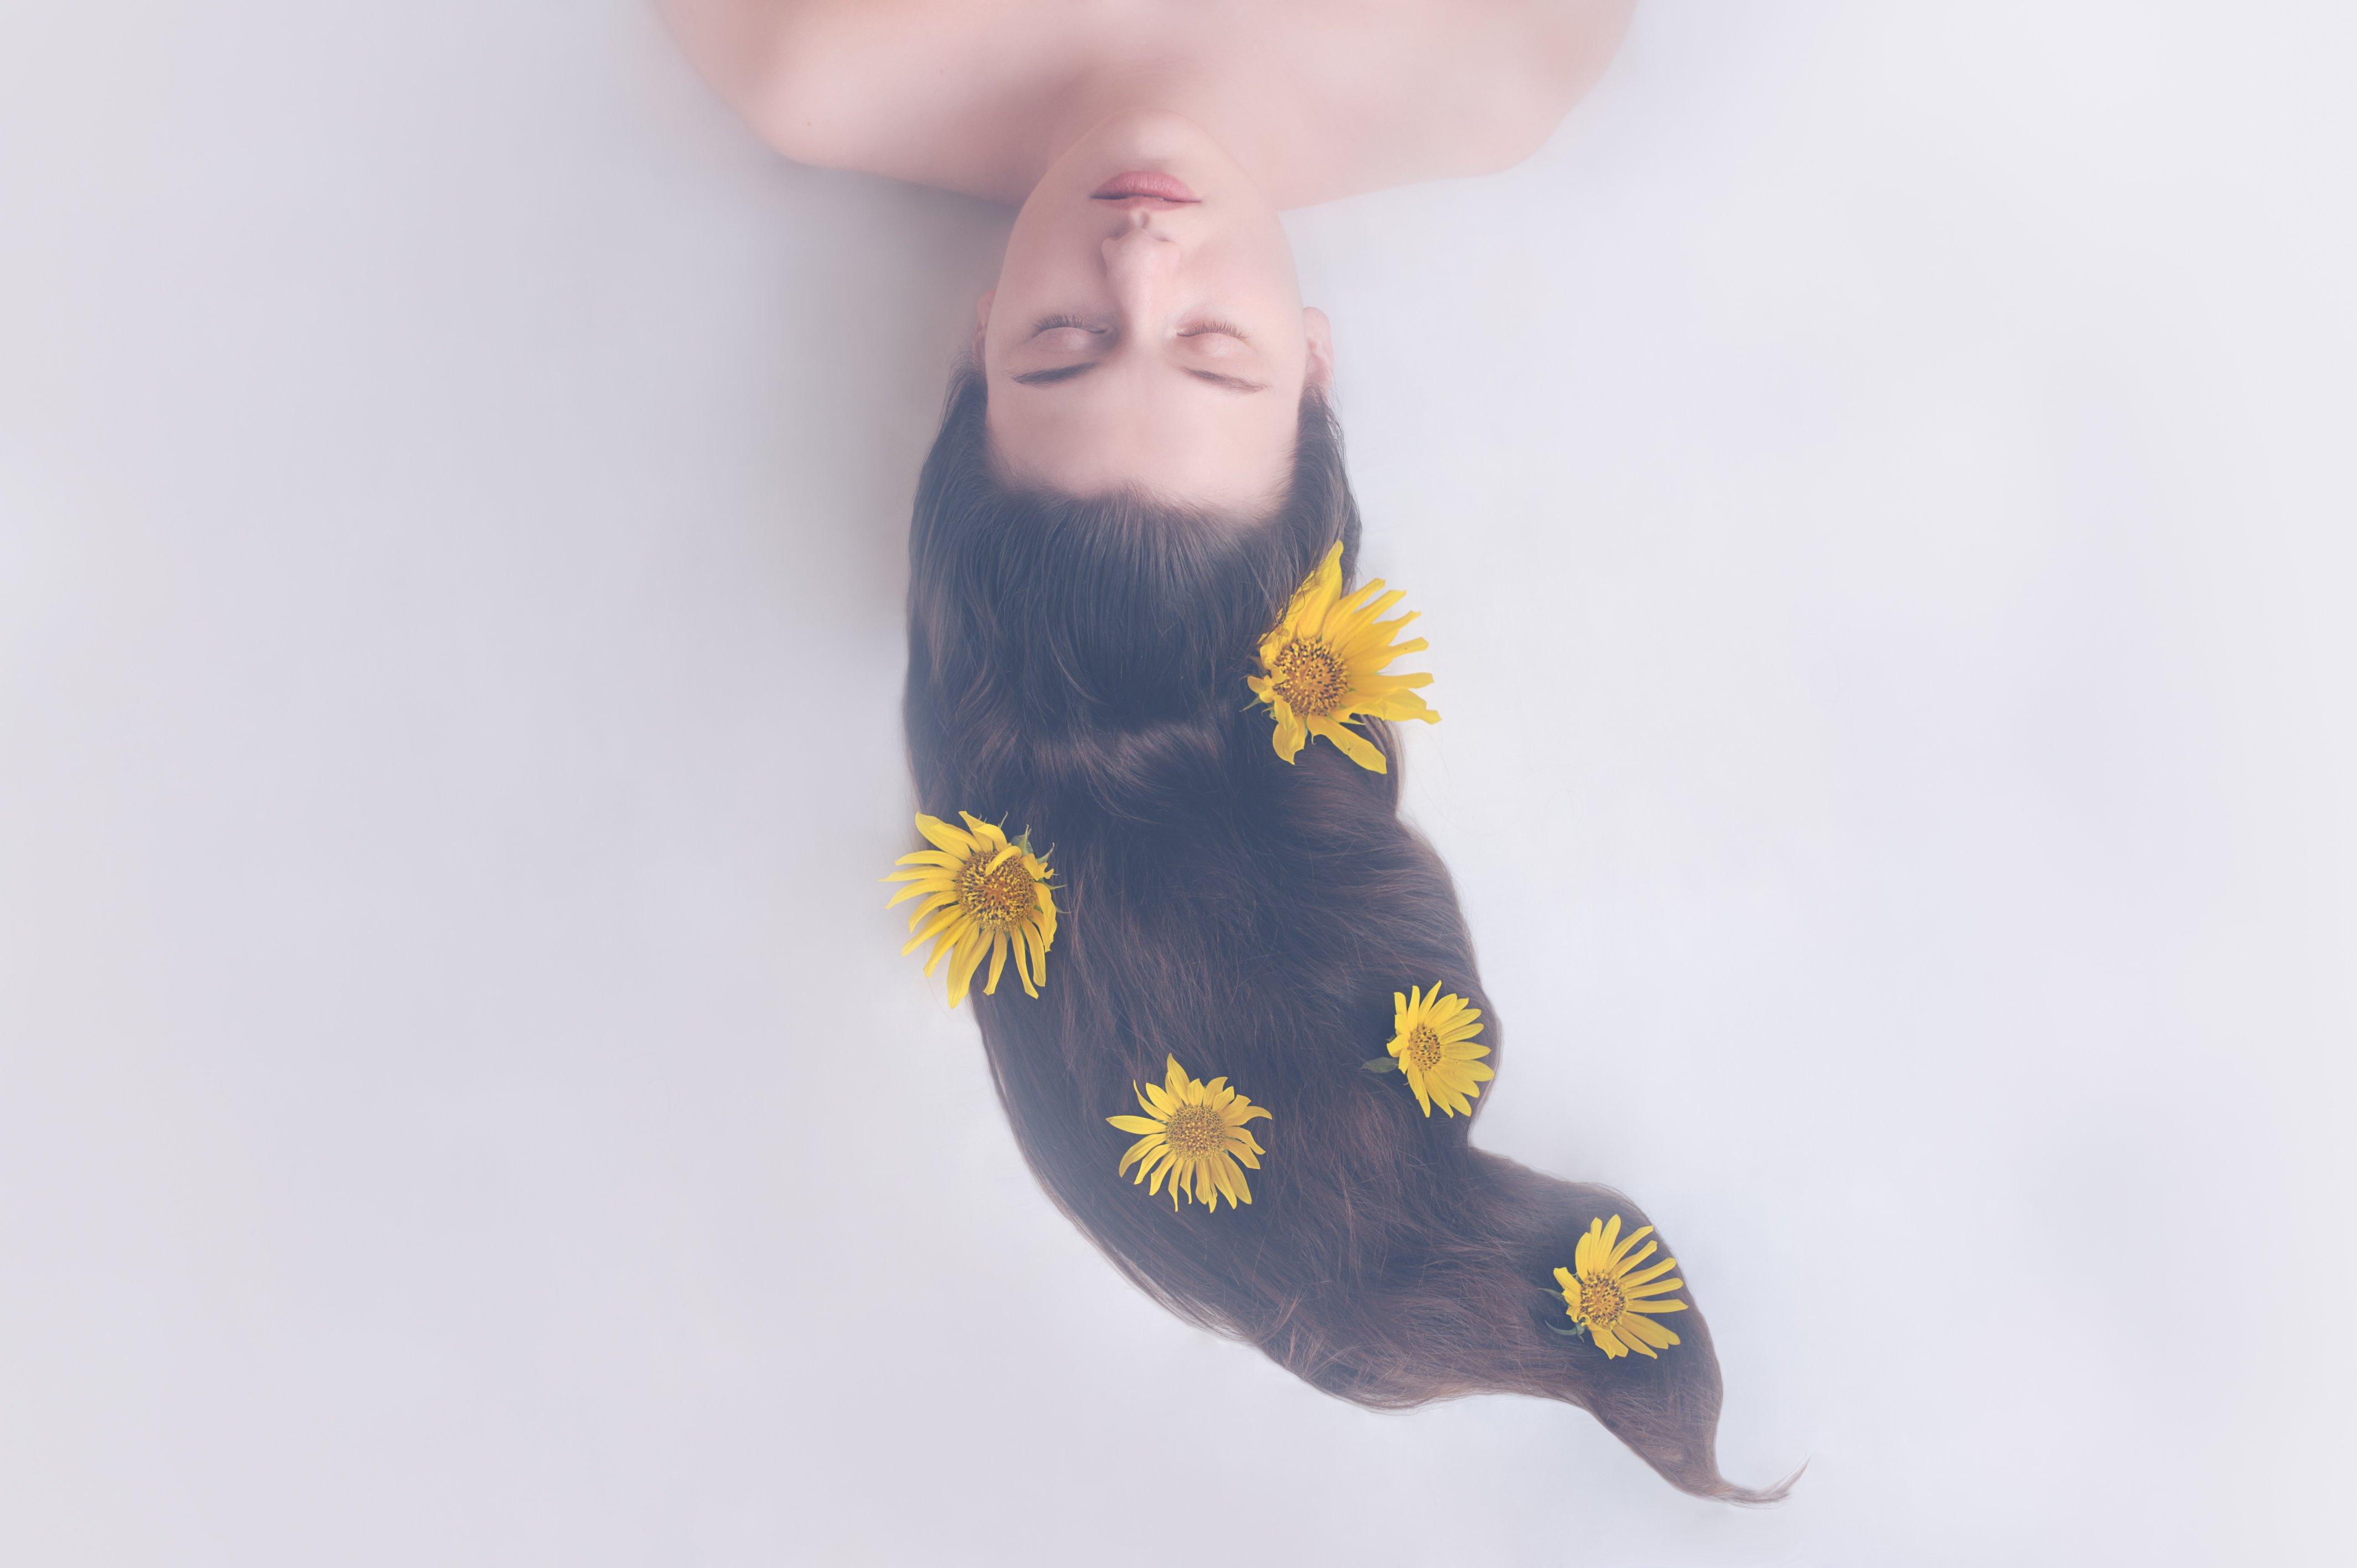 girl, sunflower, hair, sleep, eyes, closedeyes, longhair, yellow, Ekaterina Weber